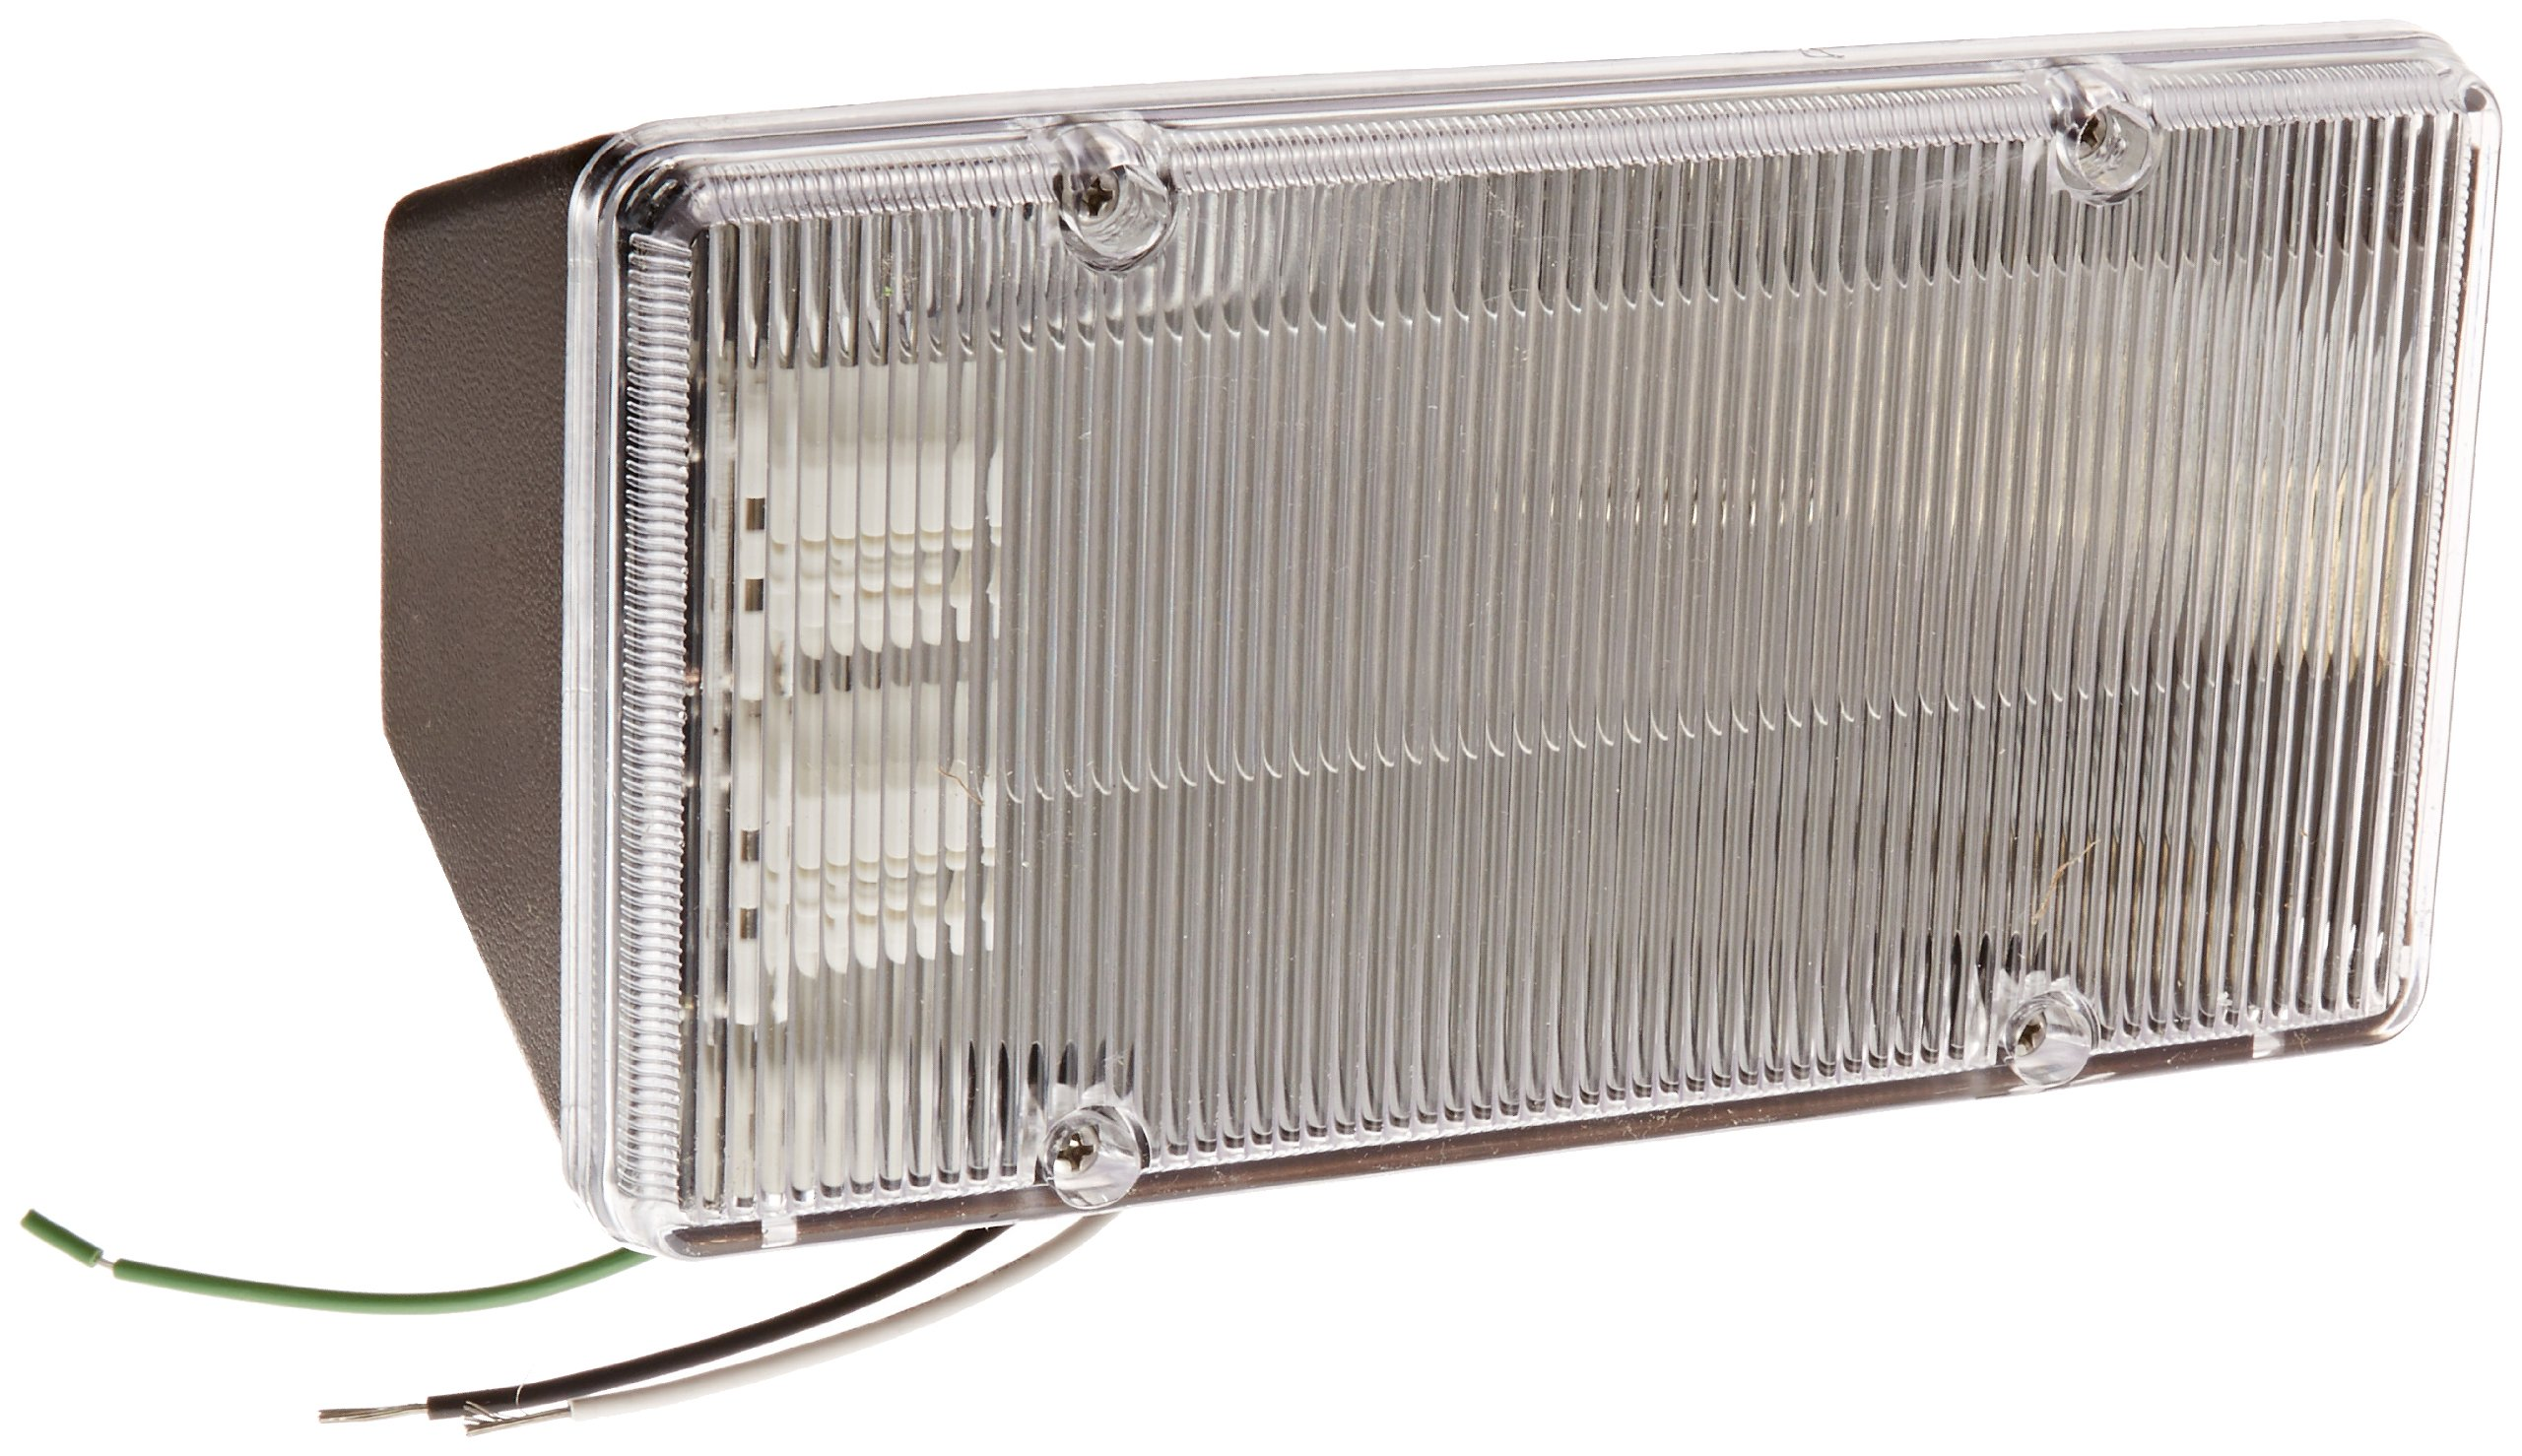 RAB Lighting PLF26 CFL PLF Fluorescent Floodlight, 13W Twin Type, Polycarbonate, 26W Power, 1800 Lumens, 208V, Bronze Color